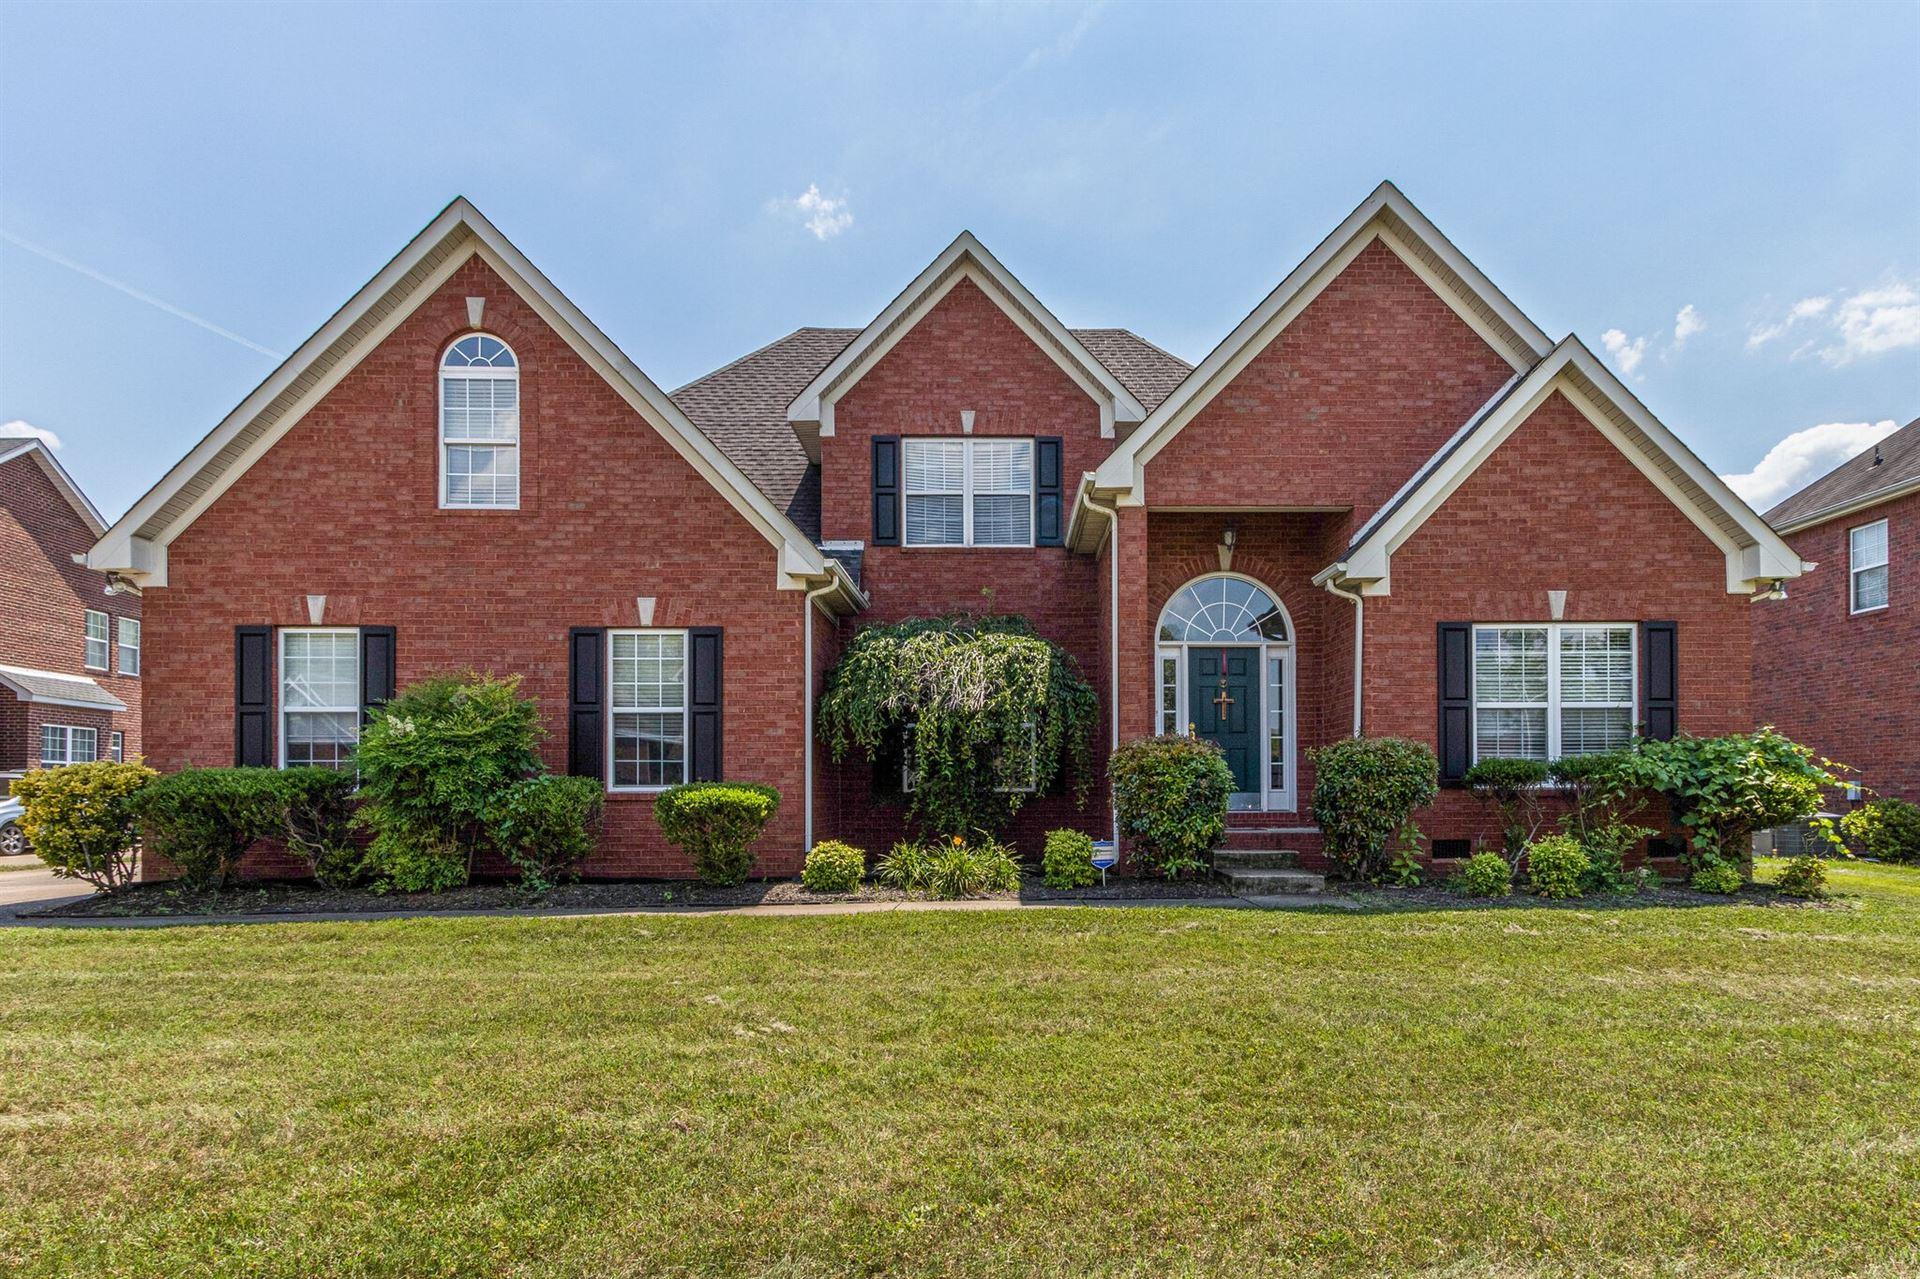 2542 Patricia Cir, Murfreesboro, TN 37128 - MLS#: 2255129